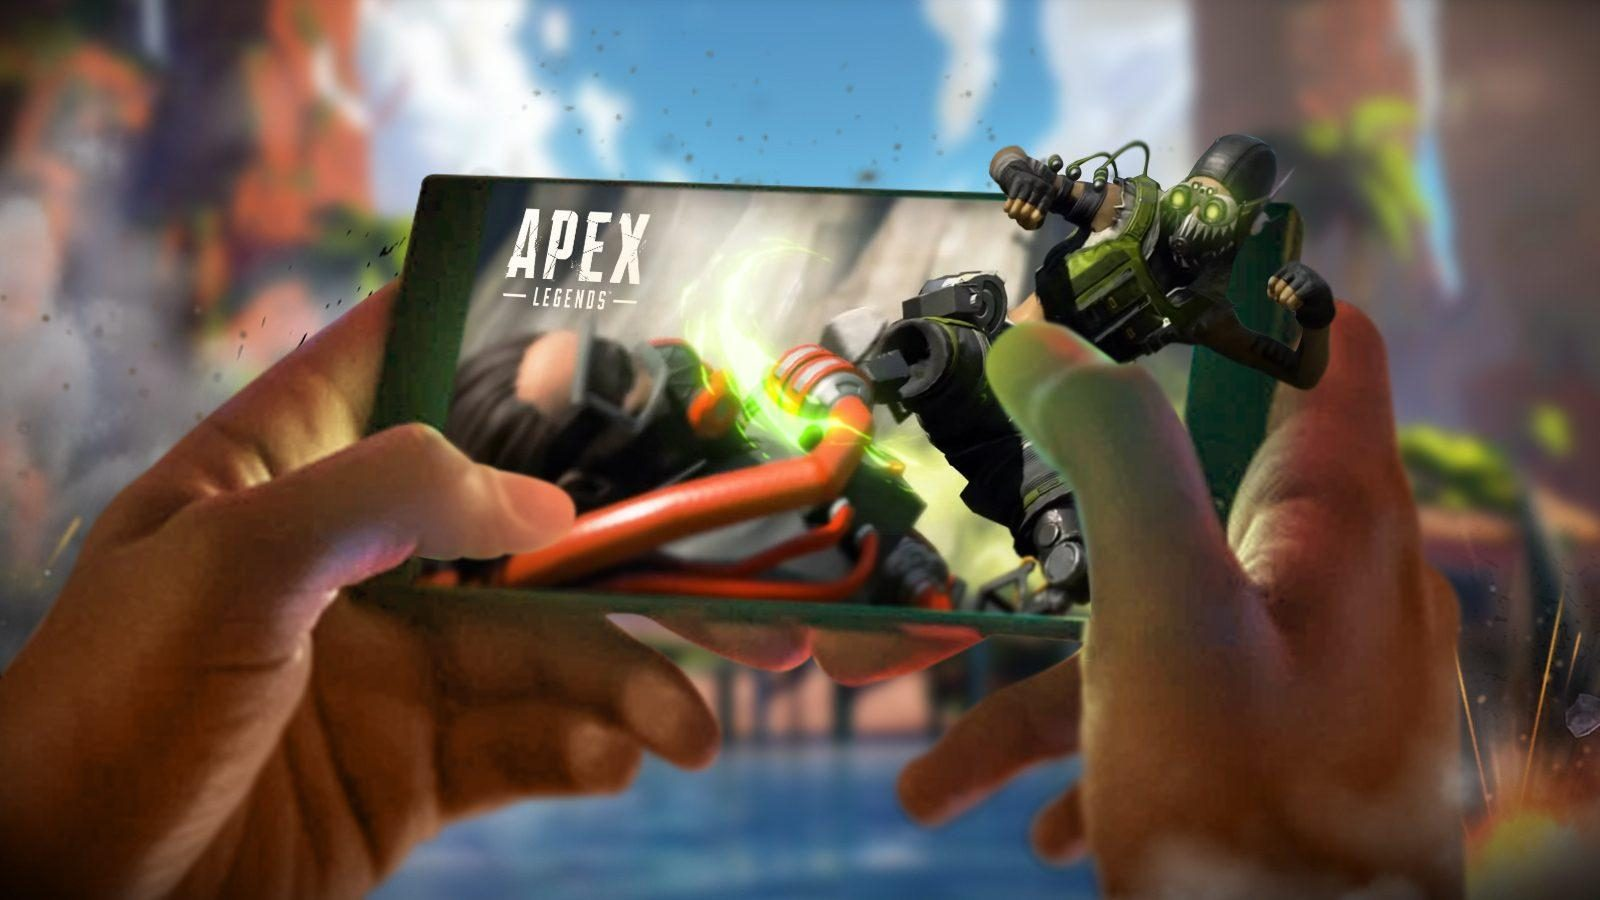 【APEX】モバイル版エーペックスのプレイ可能エリアが新たに3ヶ国追加!!